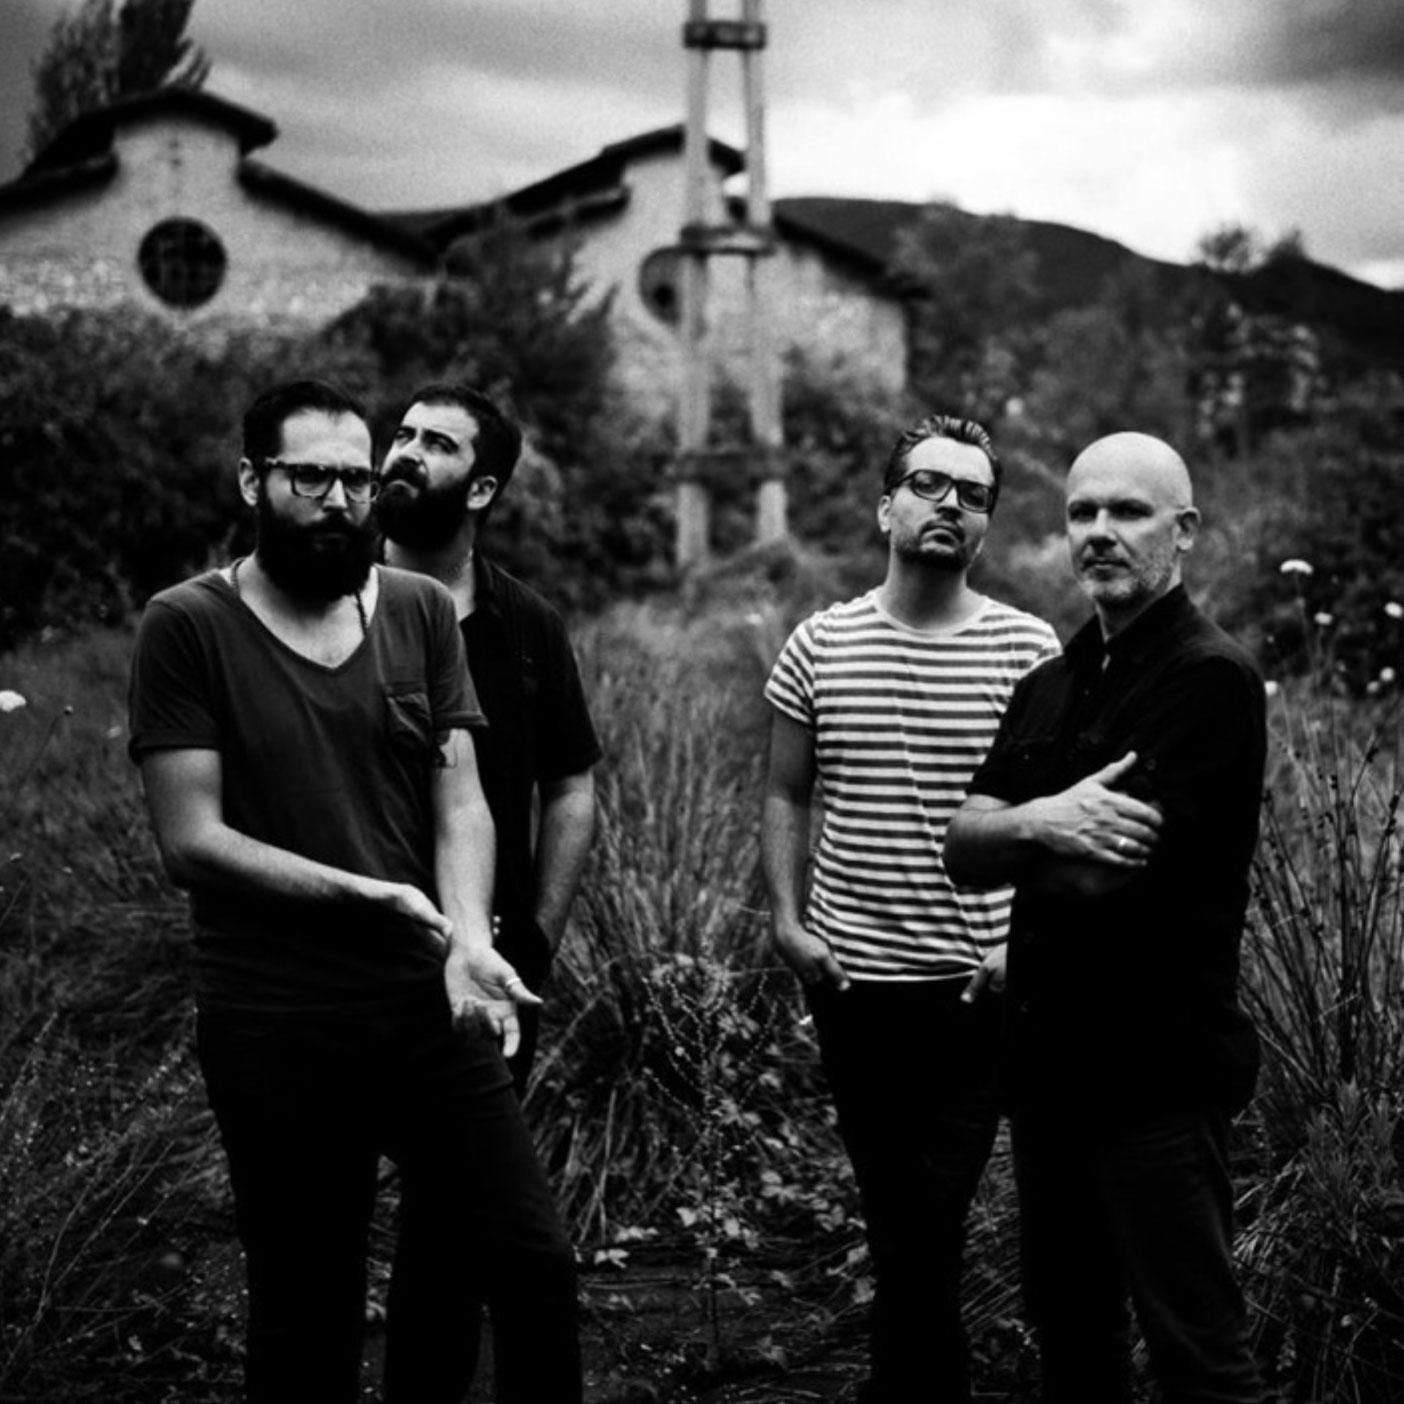 poL0 ft. Porta, De Paola, Lombardini & Salgarello 15/02/2015 21.00